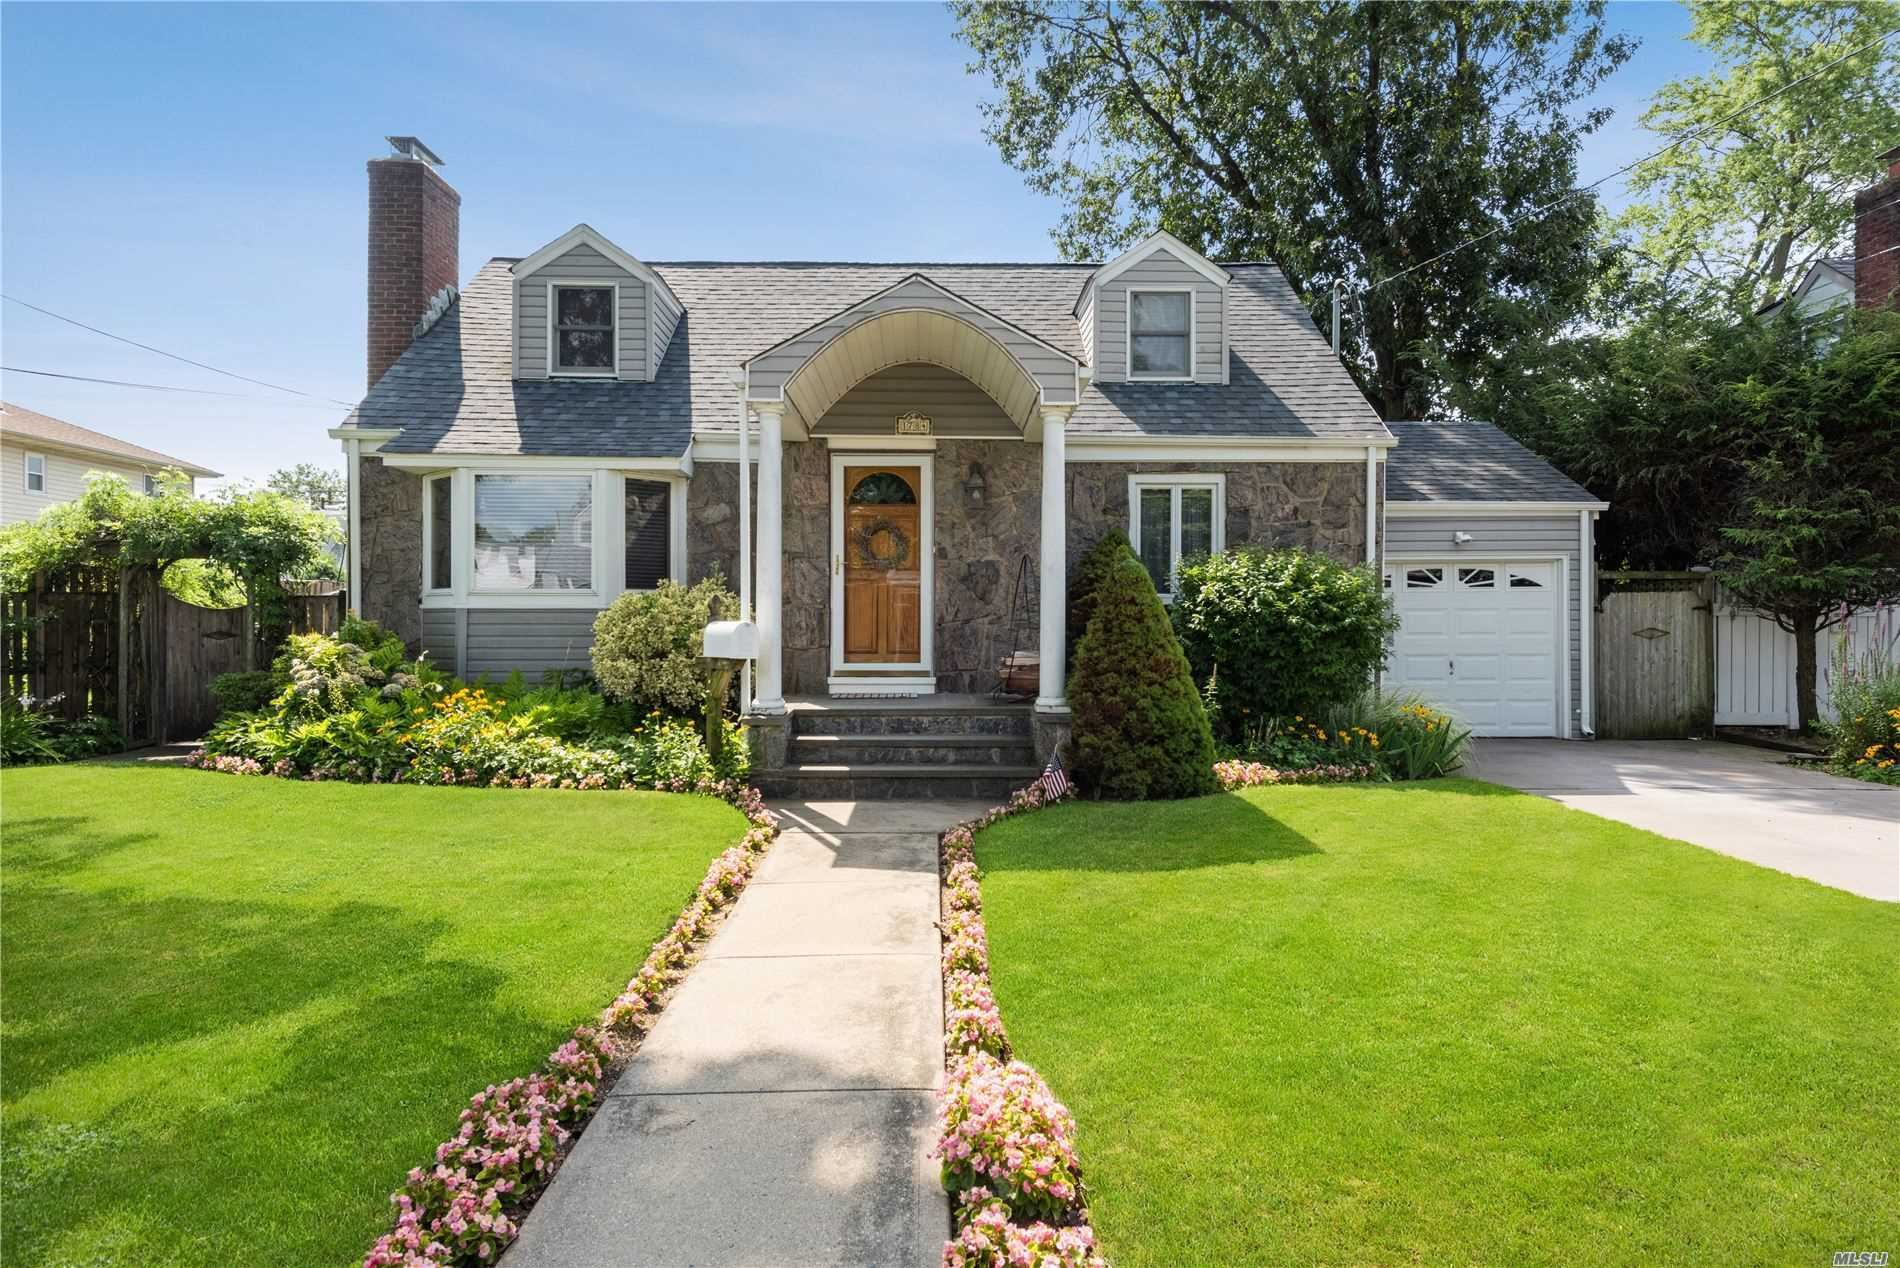 1784 Grant, East Meadow, NY 11554 - MLS#: 3238133